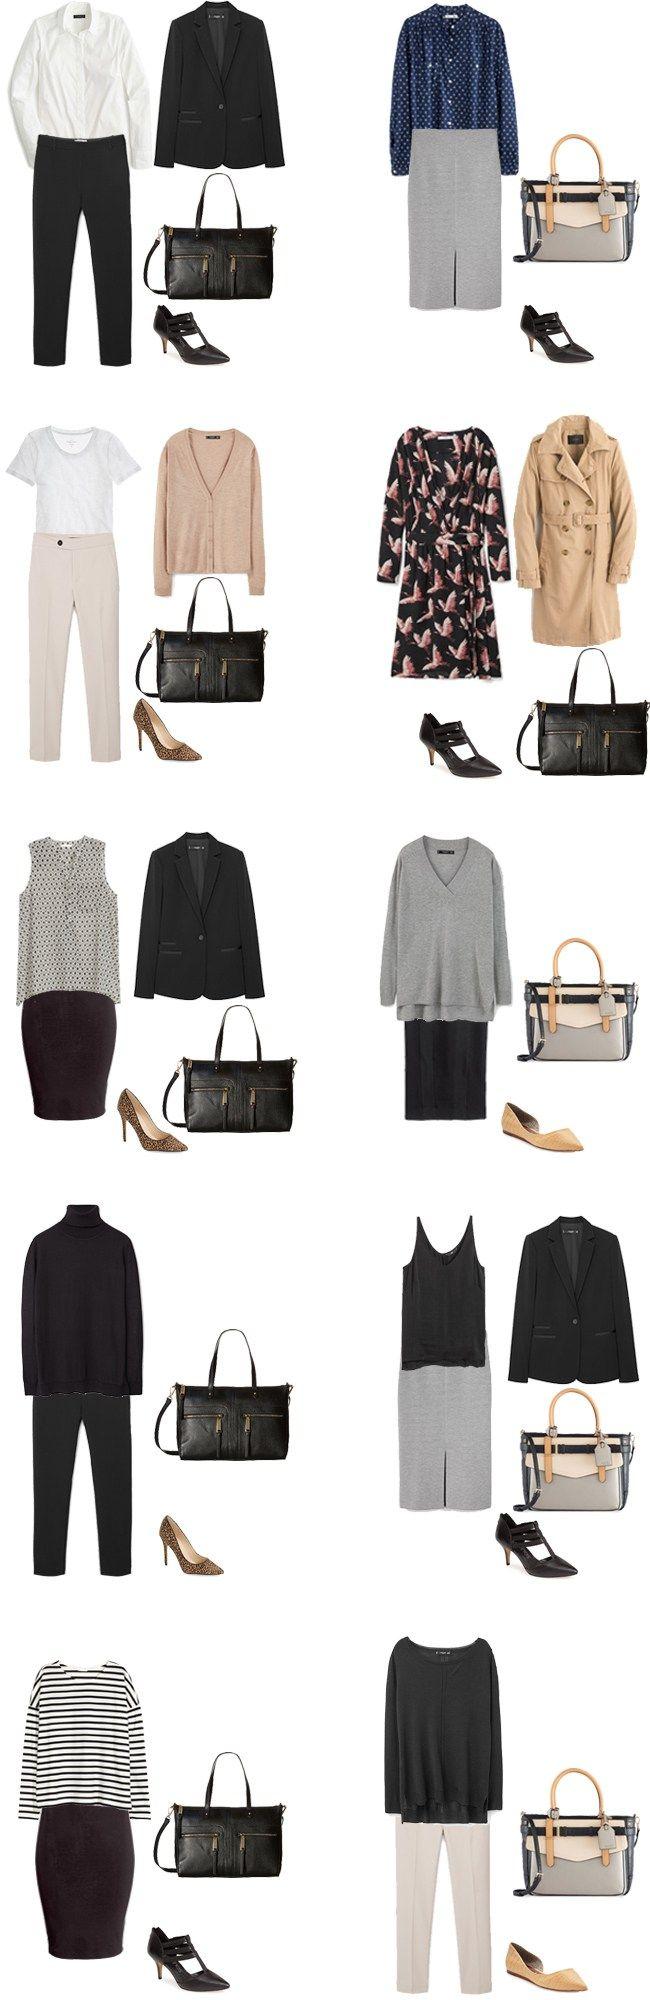 Basic Work Capsule Outfits 1-10 #capsulewardrobe #workwardrobe #workwear…